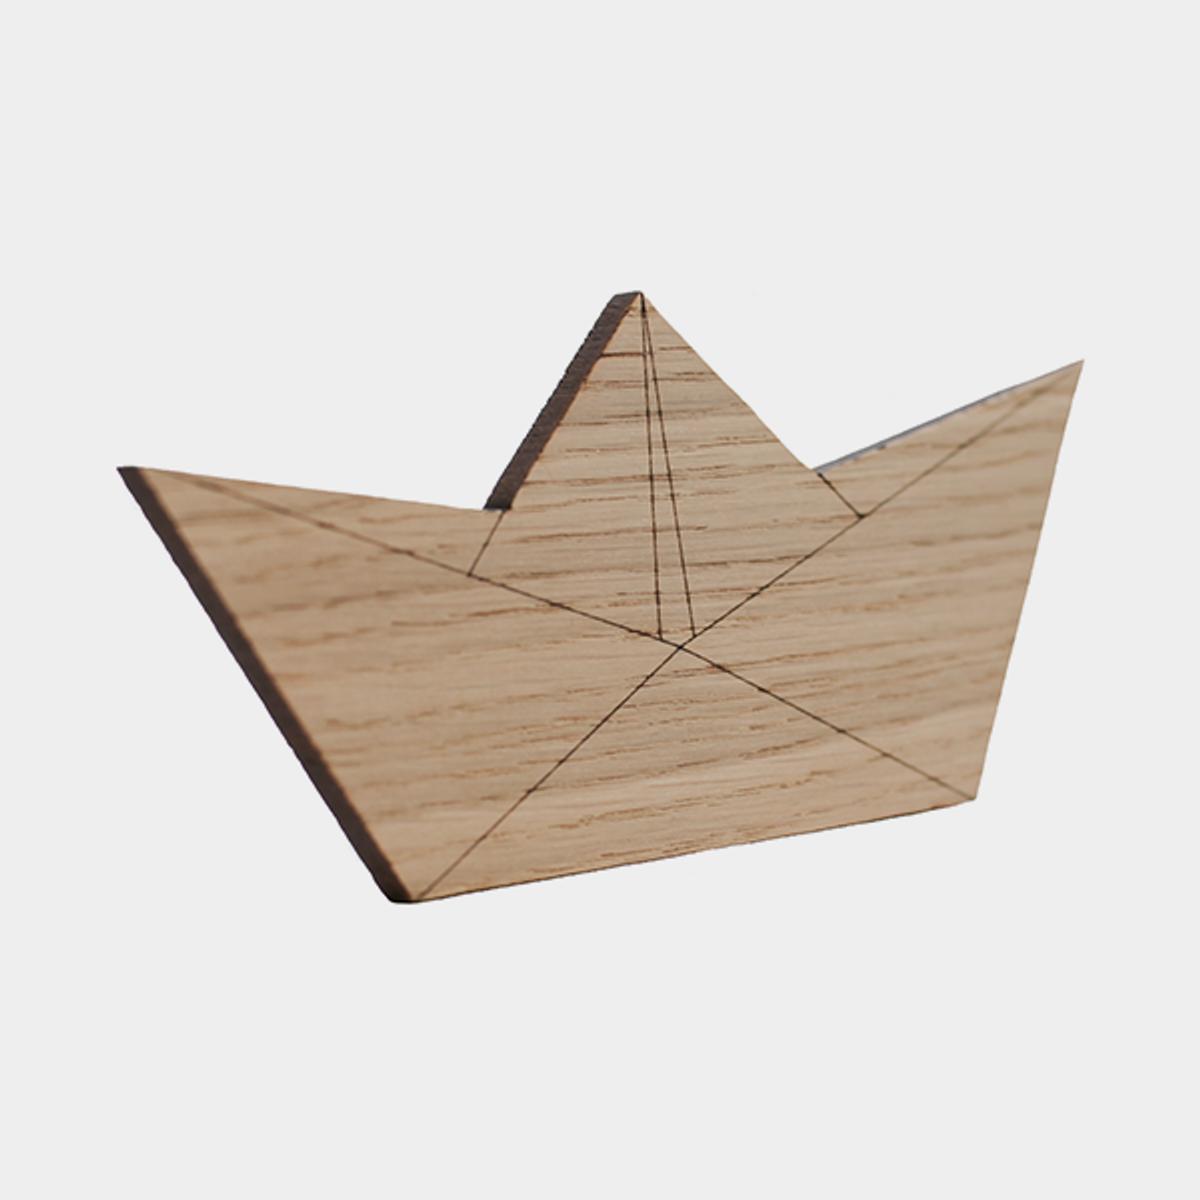 Knagg Paper Boat